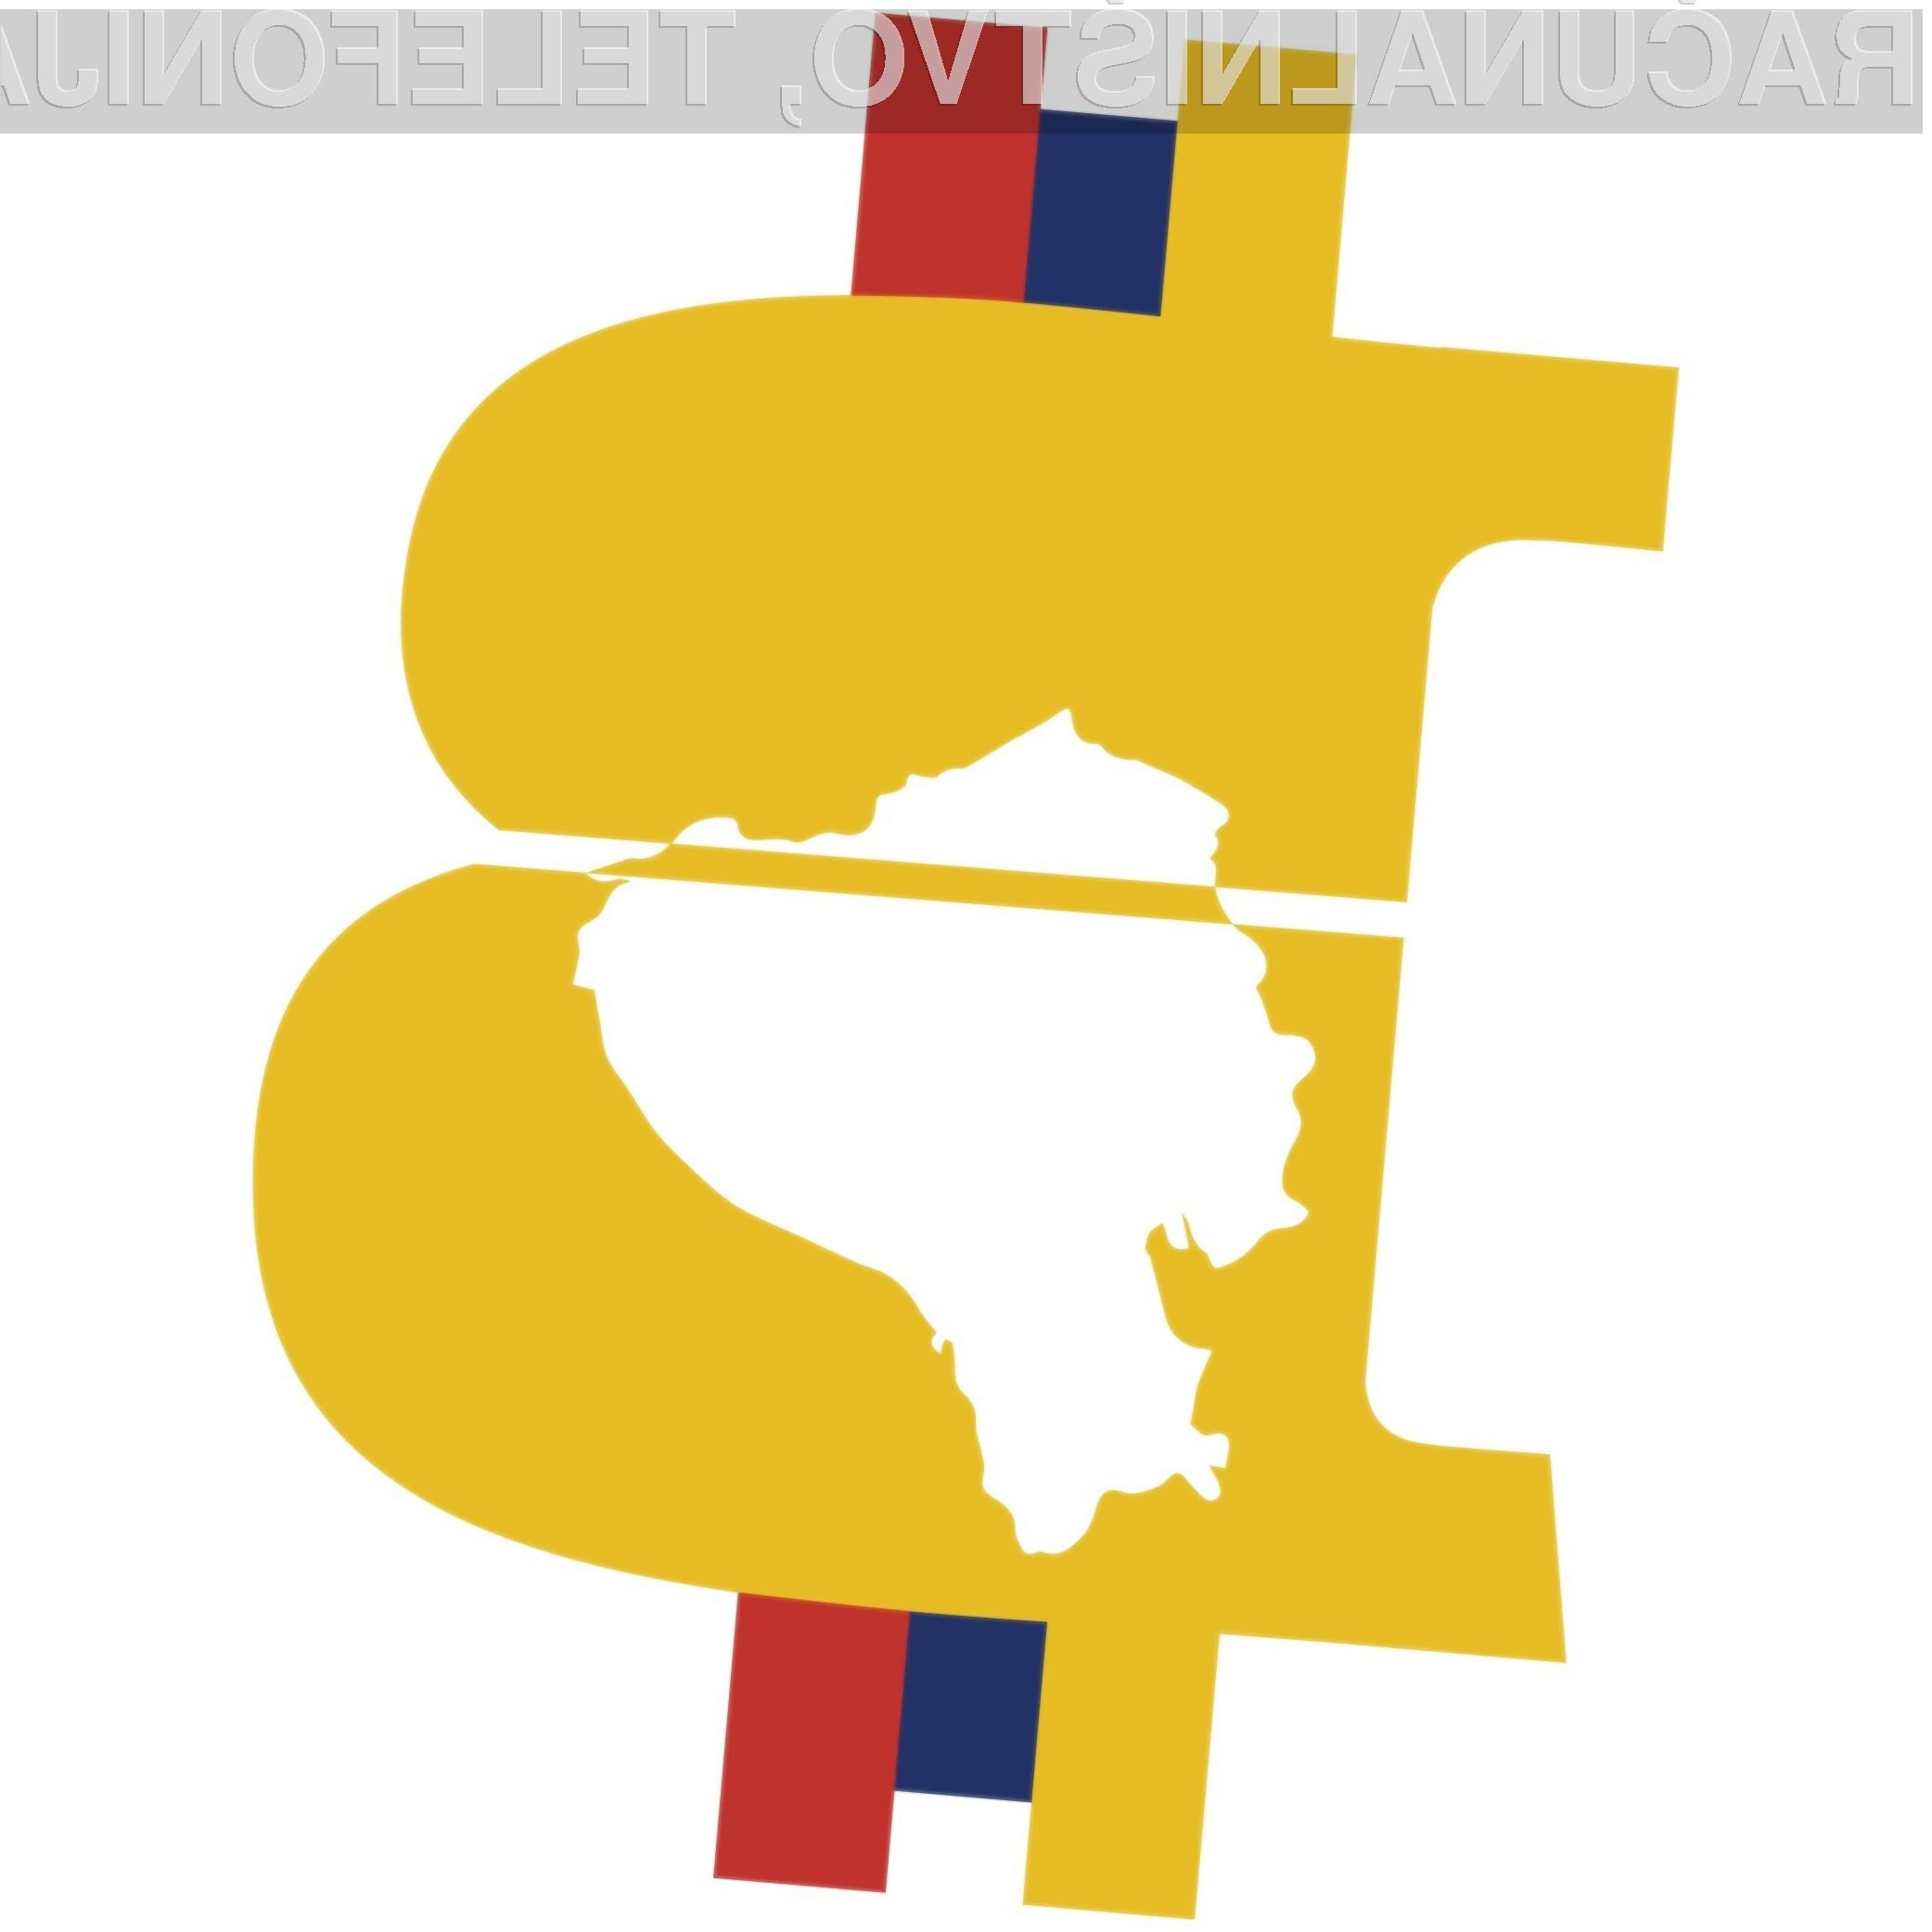 Ekvador bo imel svojo virtualno valuto!